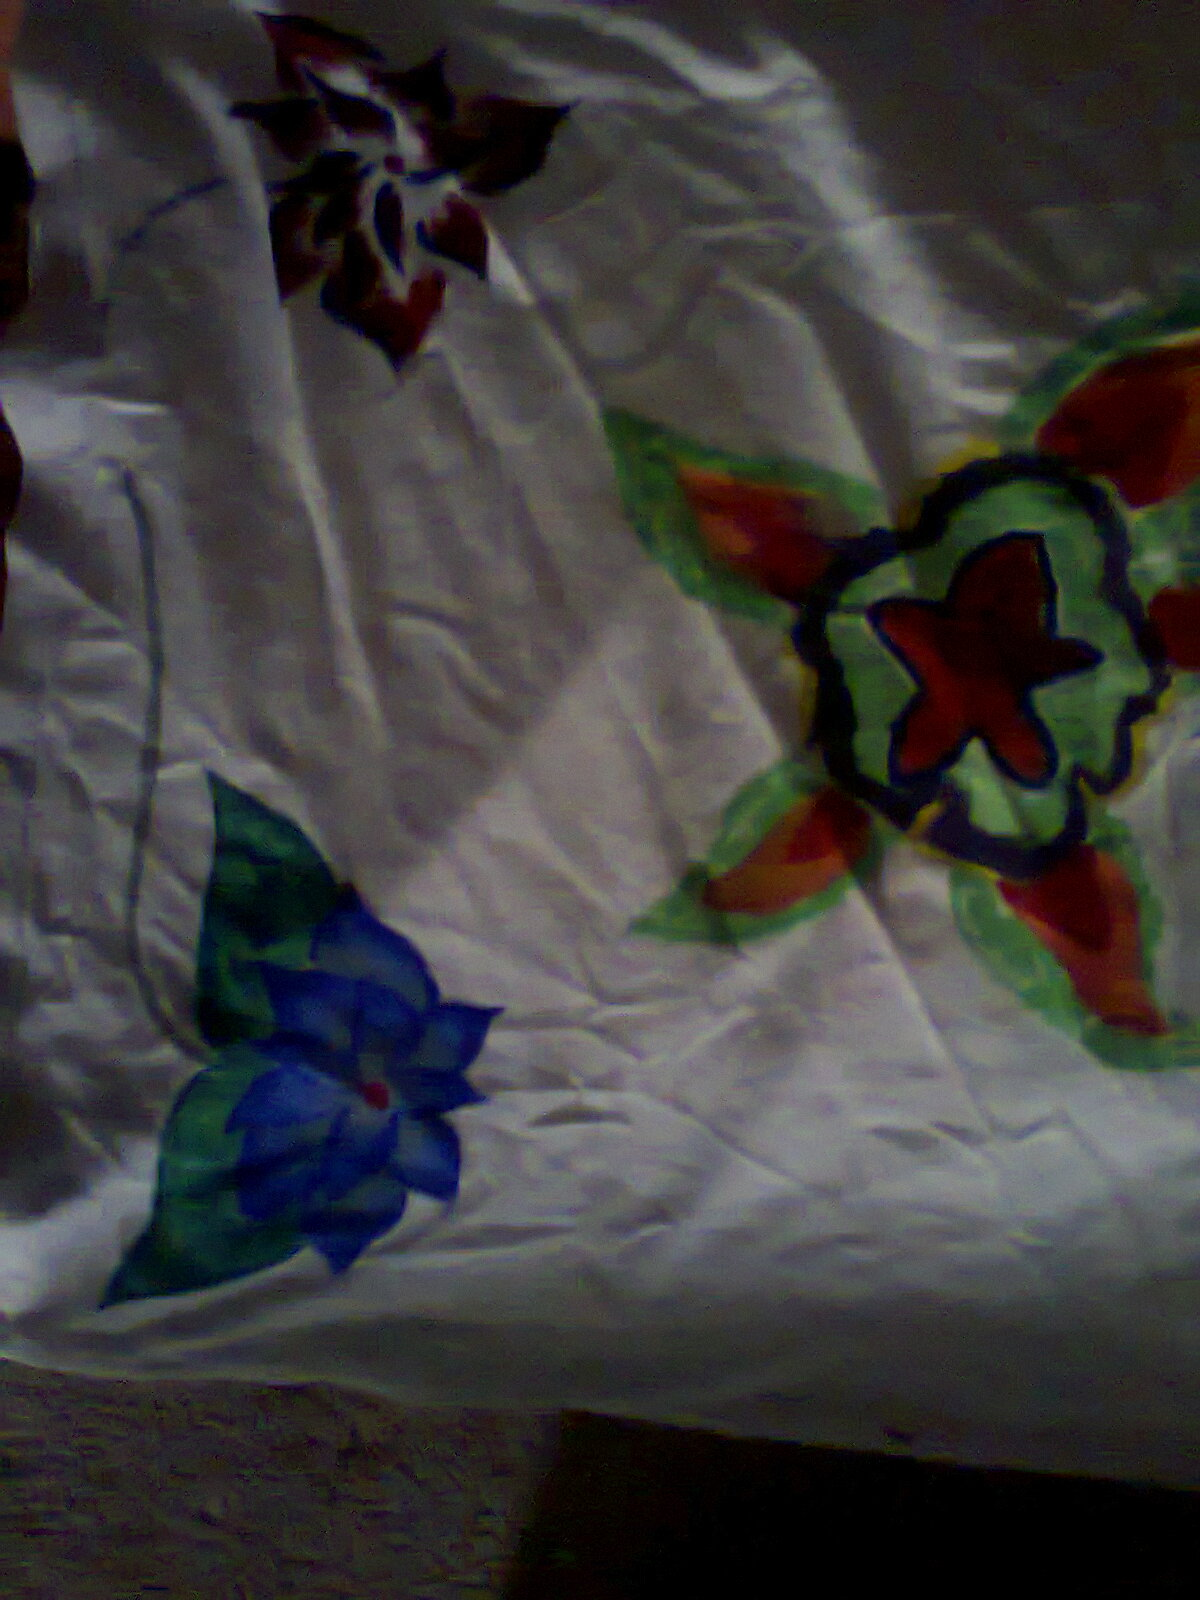 sablon bunga sederhana bunga teratai nan merah bunga teratai nan biru